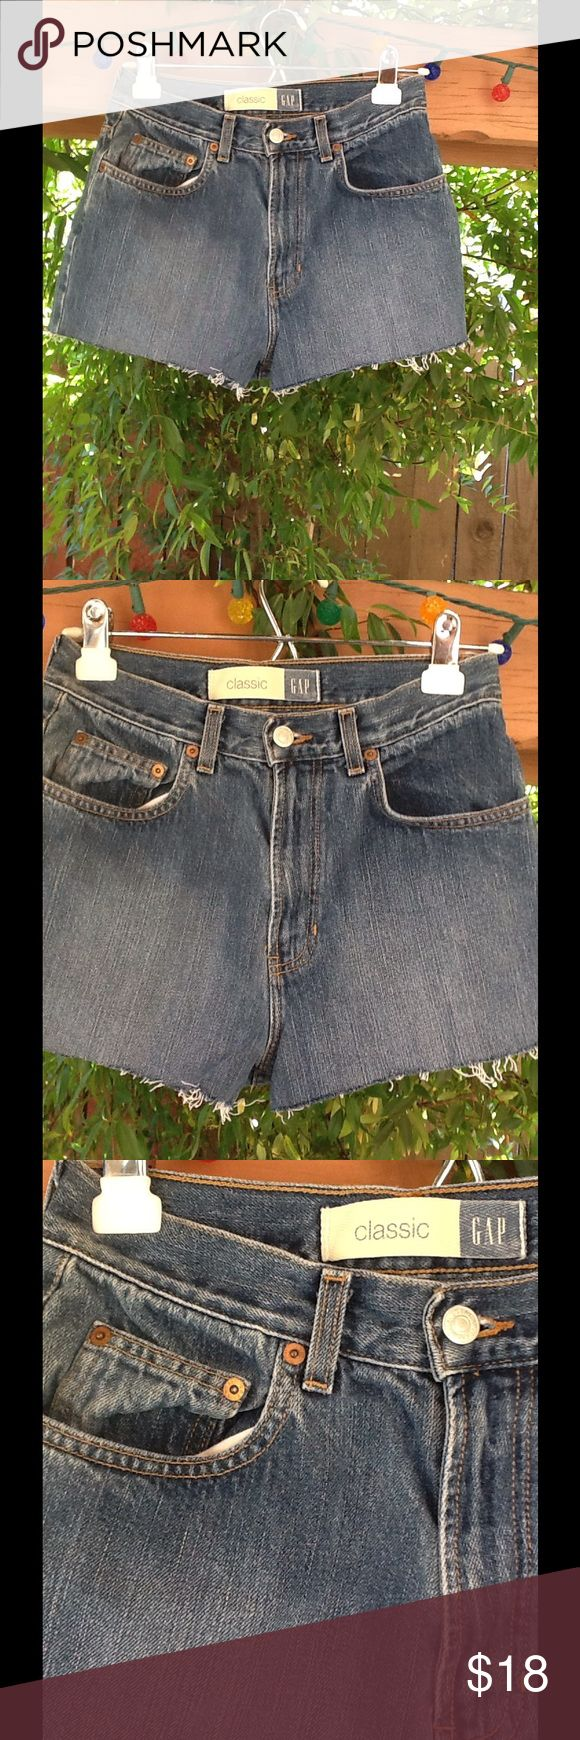 GAP cutoff Jean Shorts High Waist Size 7 8 Medium High Waist GAP shorts. (4) Gap Shorts Jean Shorts